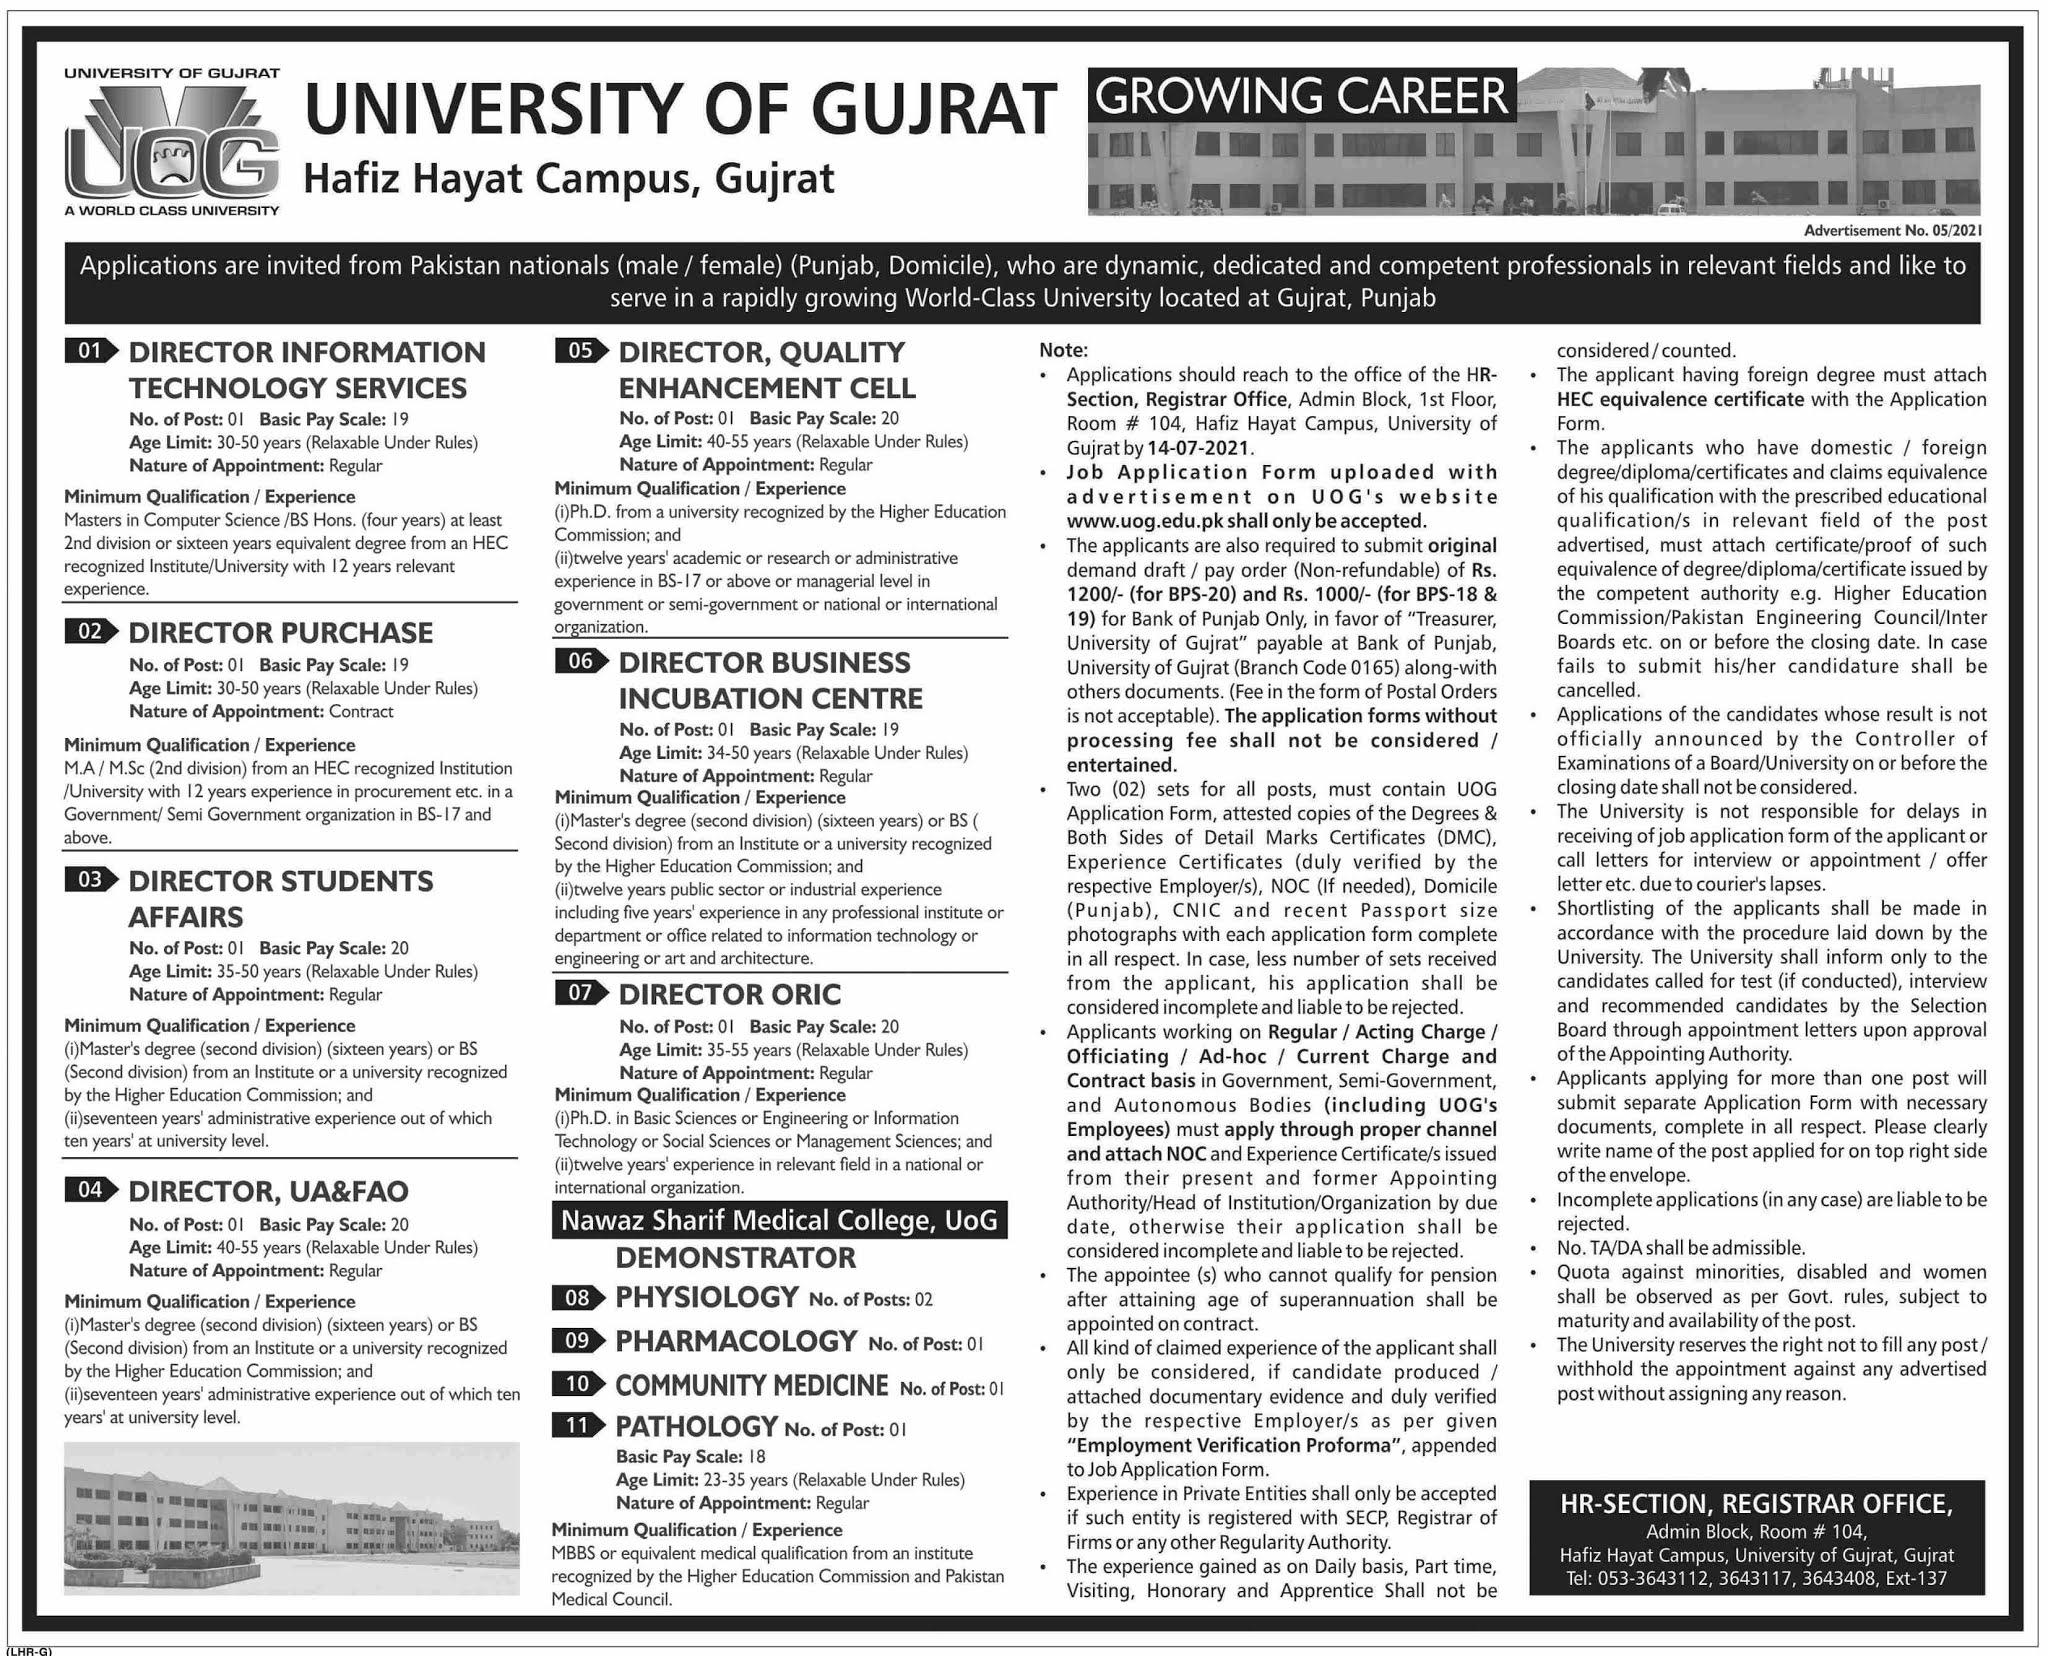 www.uog.edu.pk - University of Gujrat Jobs 2021 Latest For Teaching Staff - UOG Jobs 2021 Advertisement